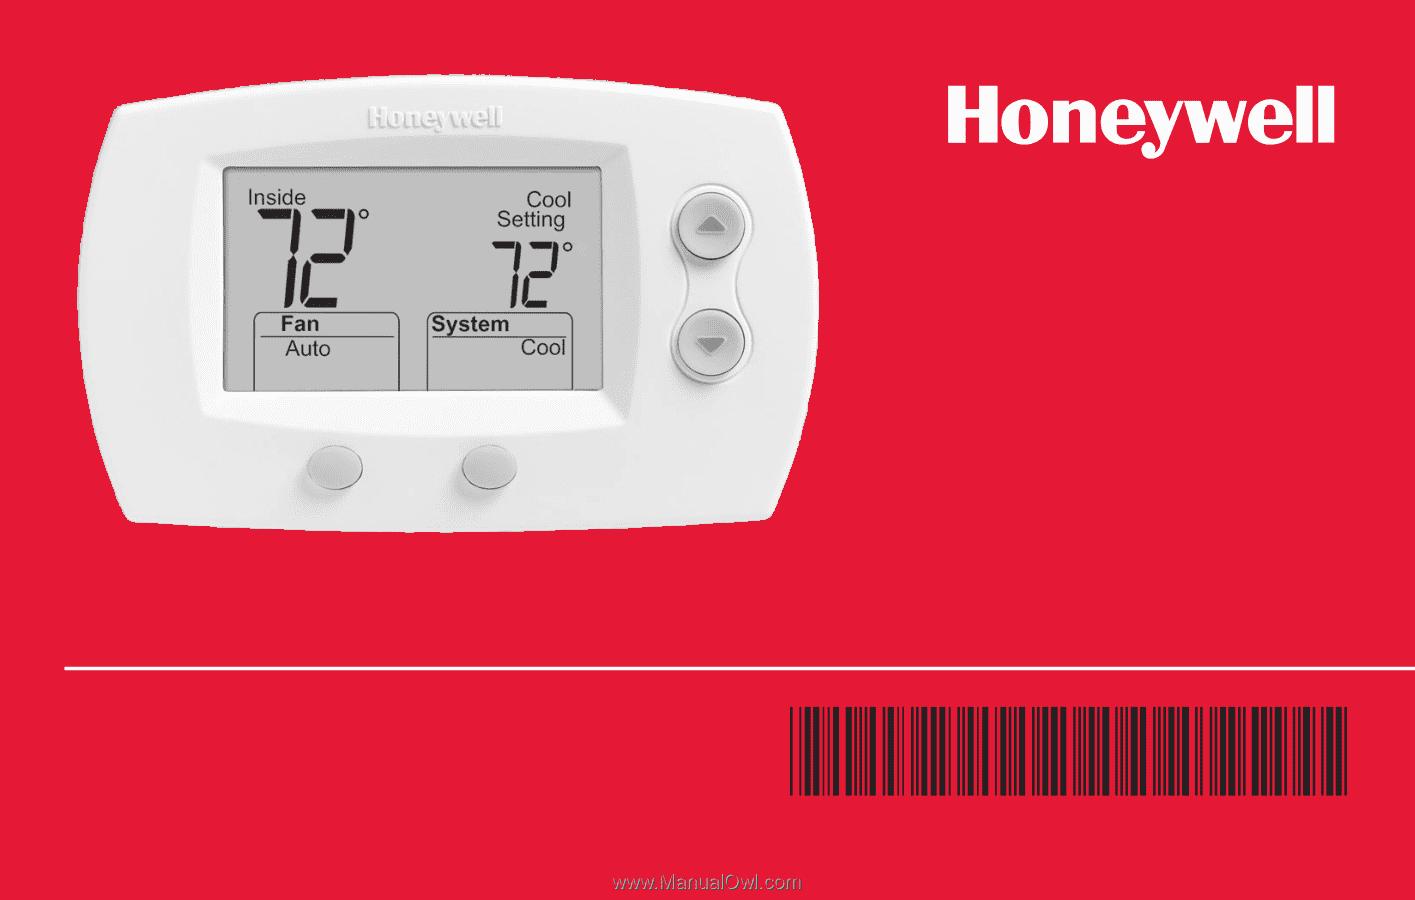 Honeywell Thermostat Installation Manual Th5220d1003 Wiring Diagram Owner S Rh Manualowl Com Th5220d Digital